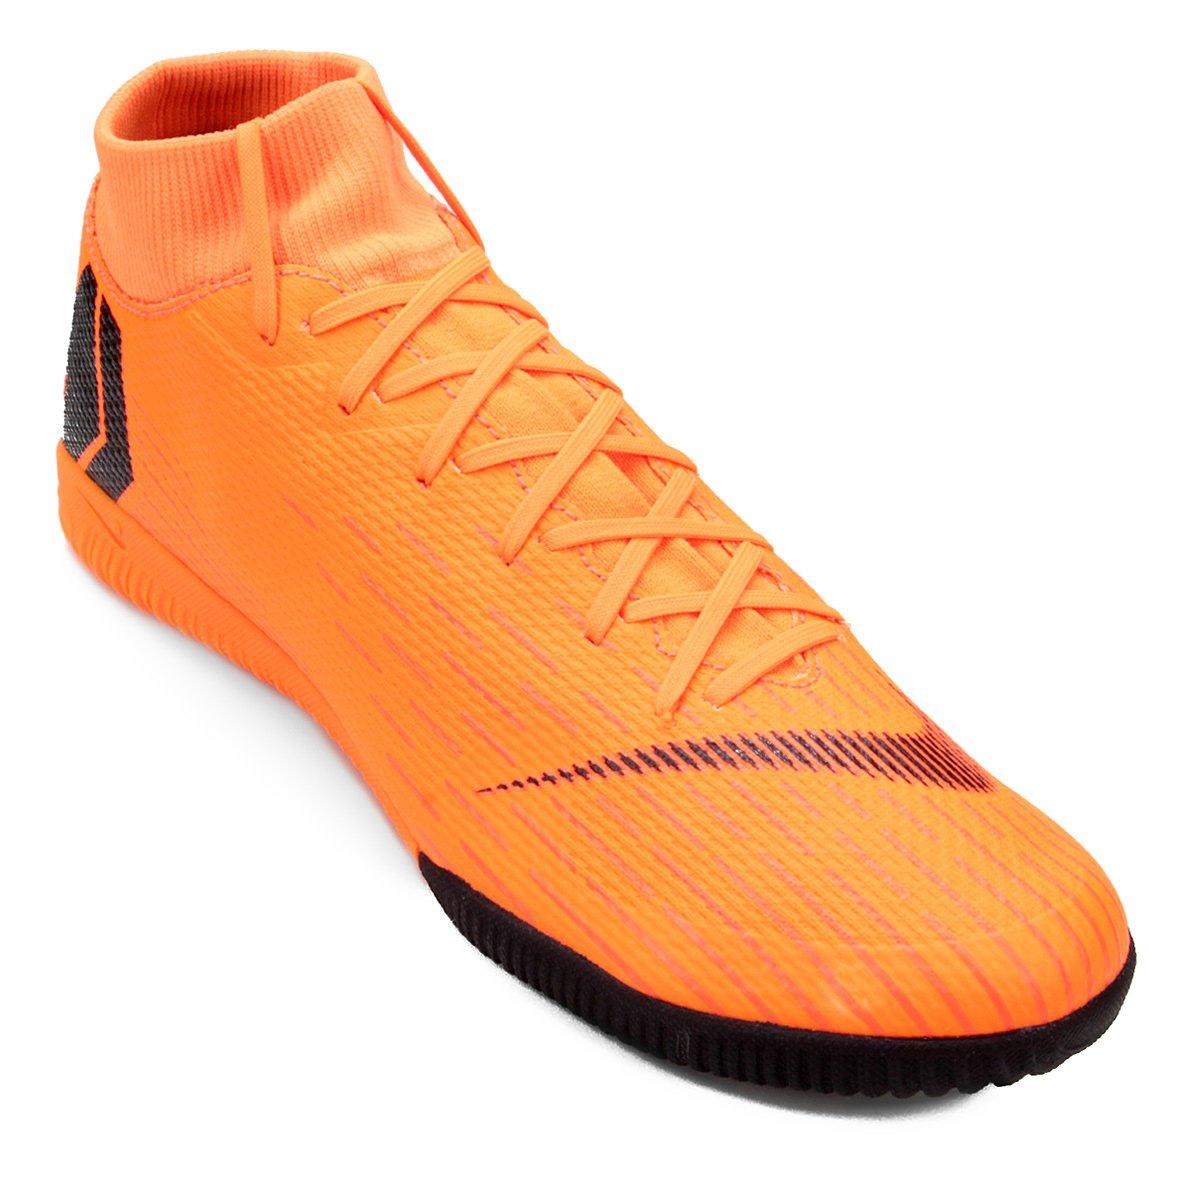 581cbfcff482b ... australia chuteira futsal nike mercurial superfly 6 academy masculina  laranjapreto ec0fb 694ef ...